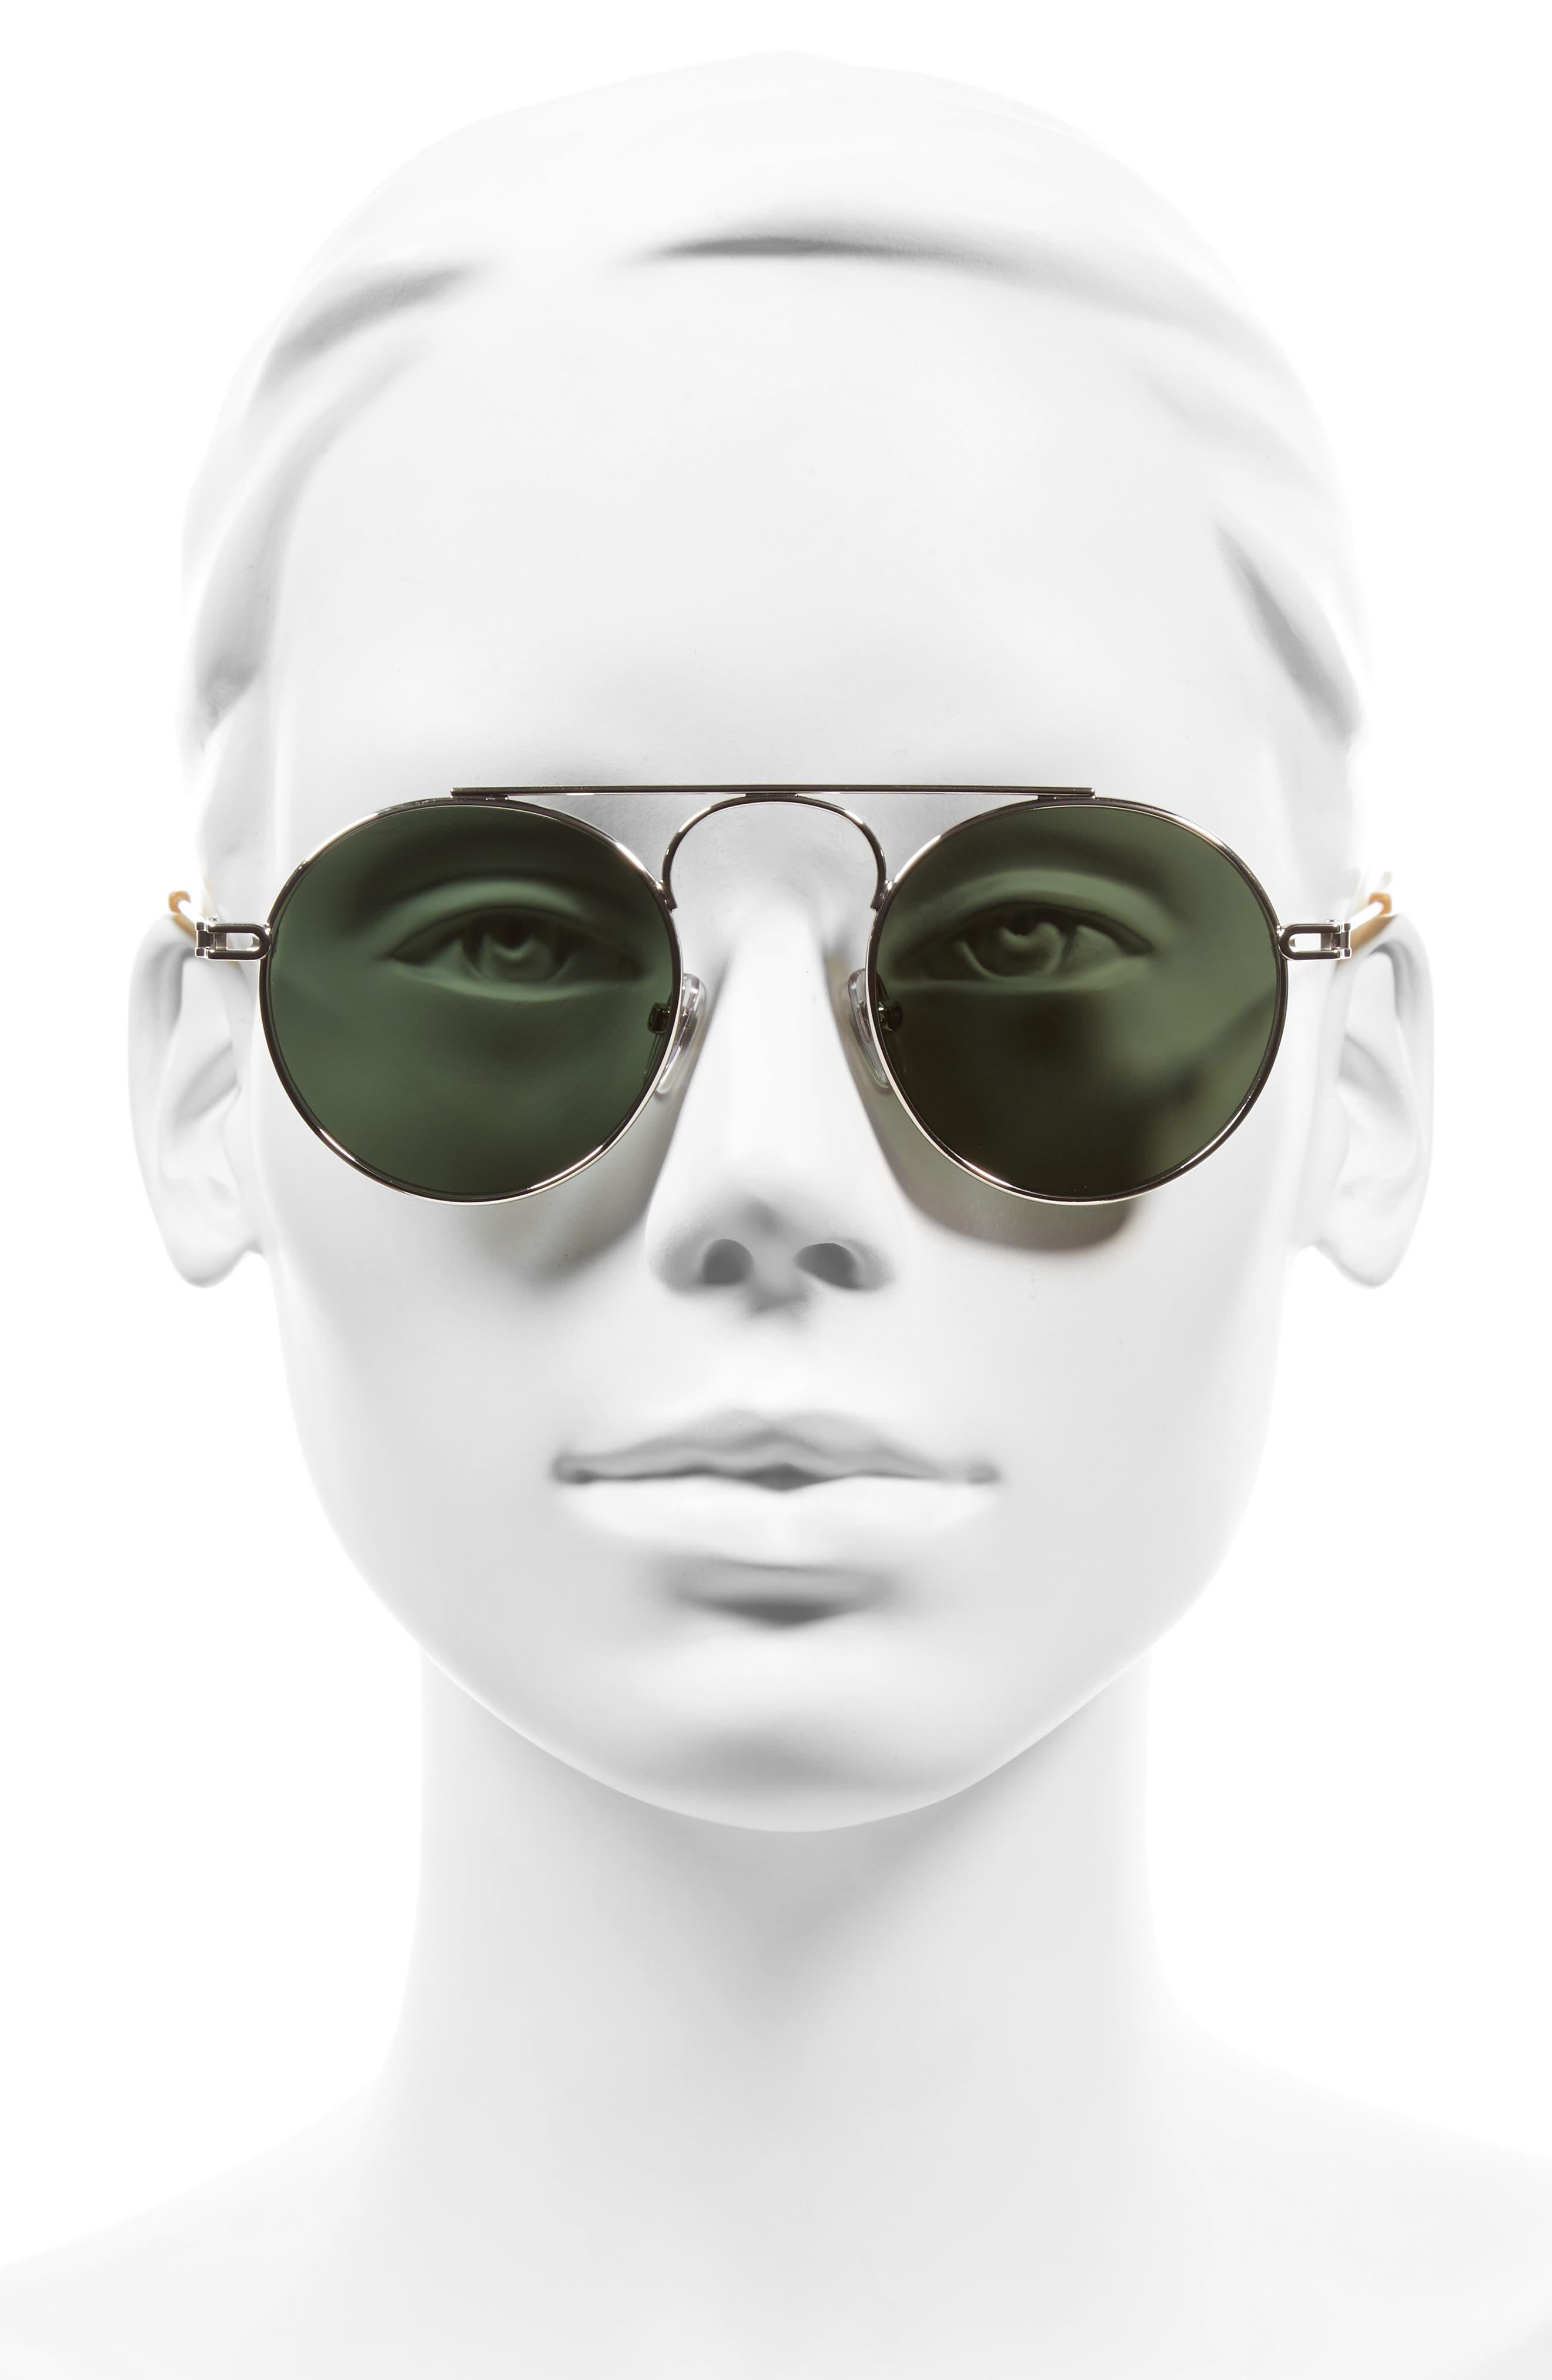 48mm Round Sunglasses,                             Alternate thumbnail 2, color,                             043